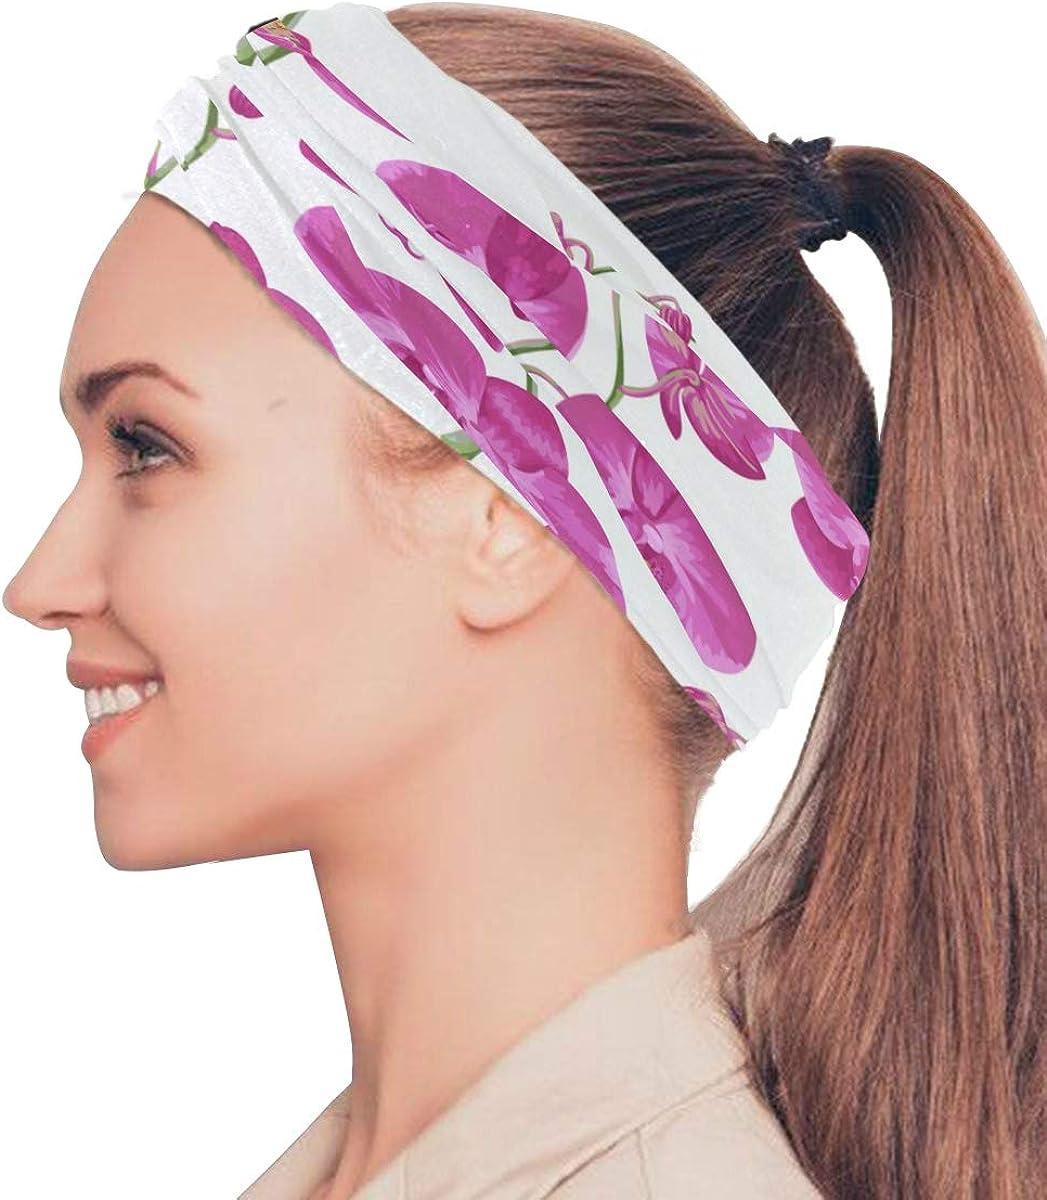 PRETTY FLORAL PINK AND PURPLE HEADWRAP HAIR WRAP BANDANA LADIES GIRLS NEW